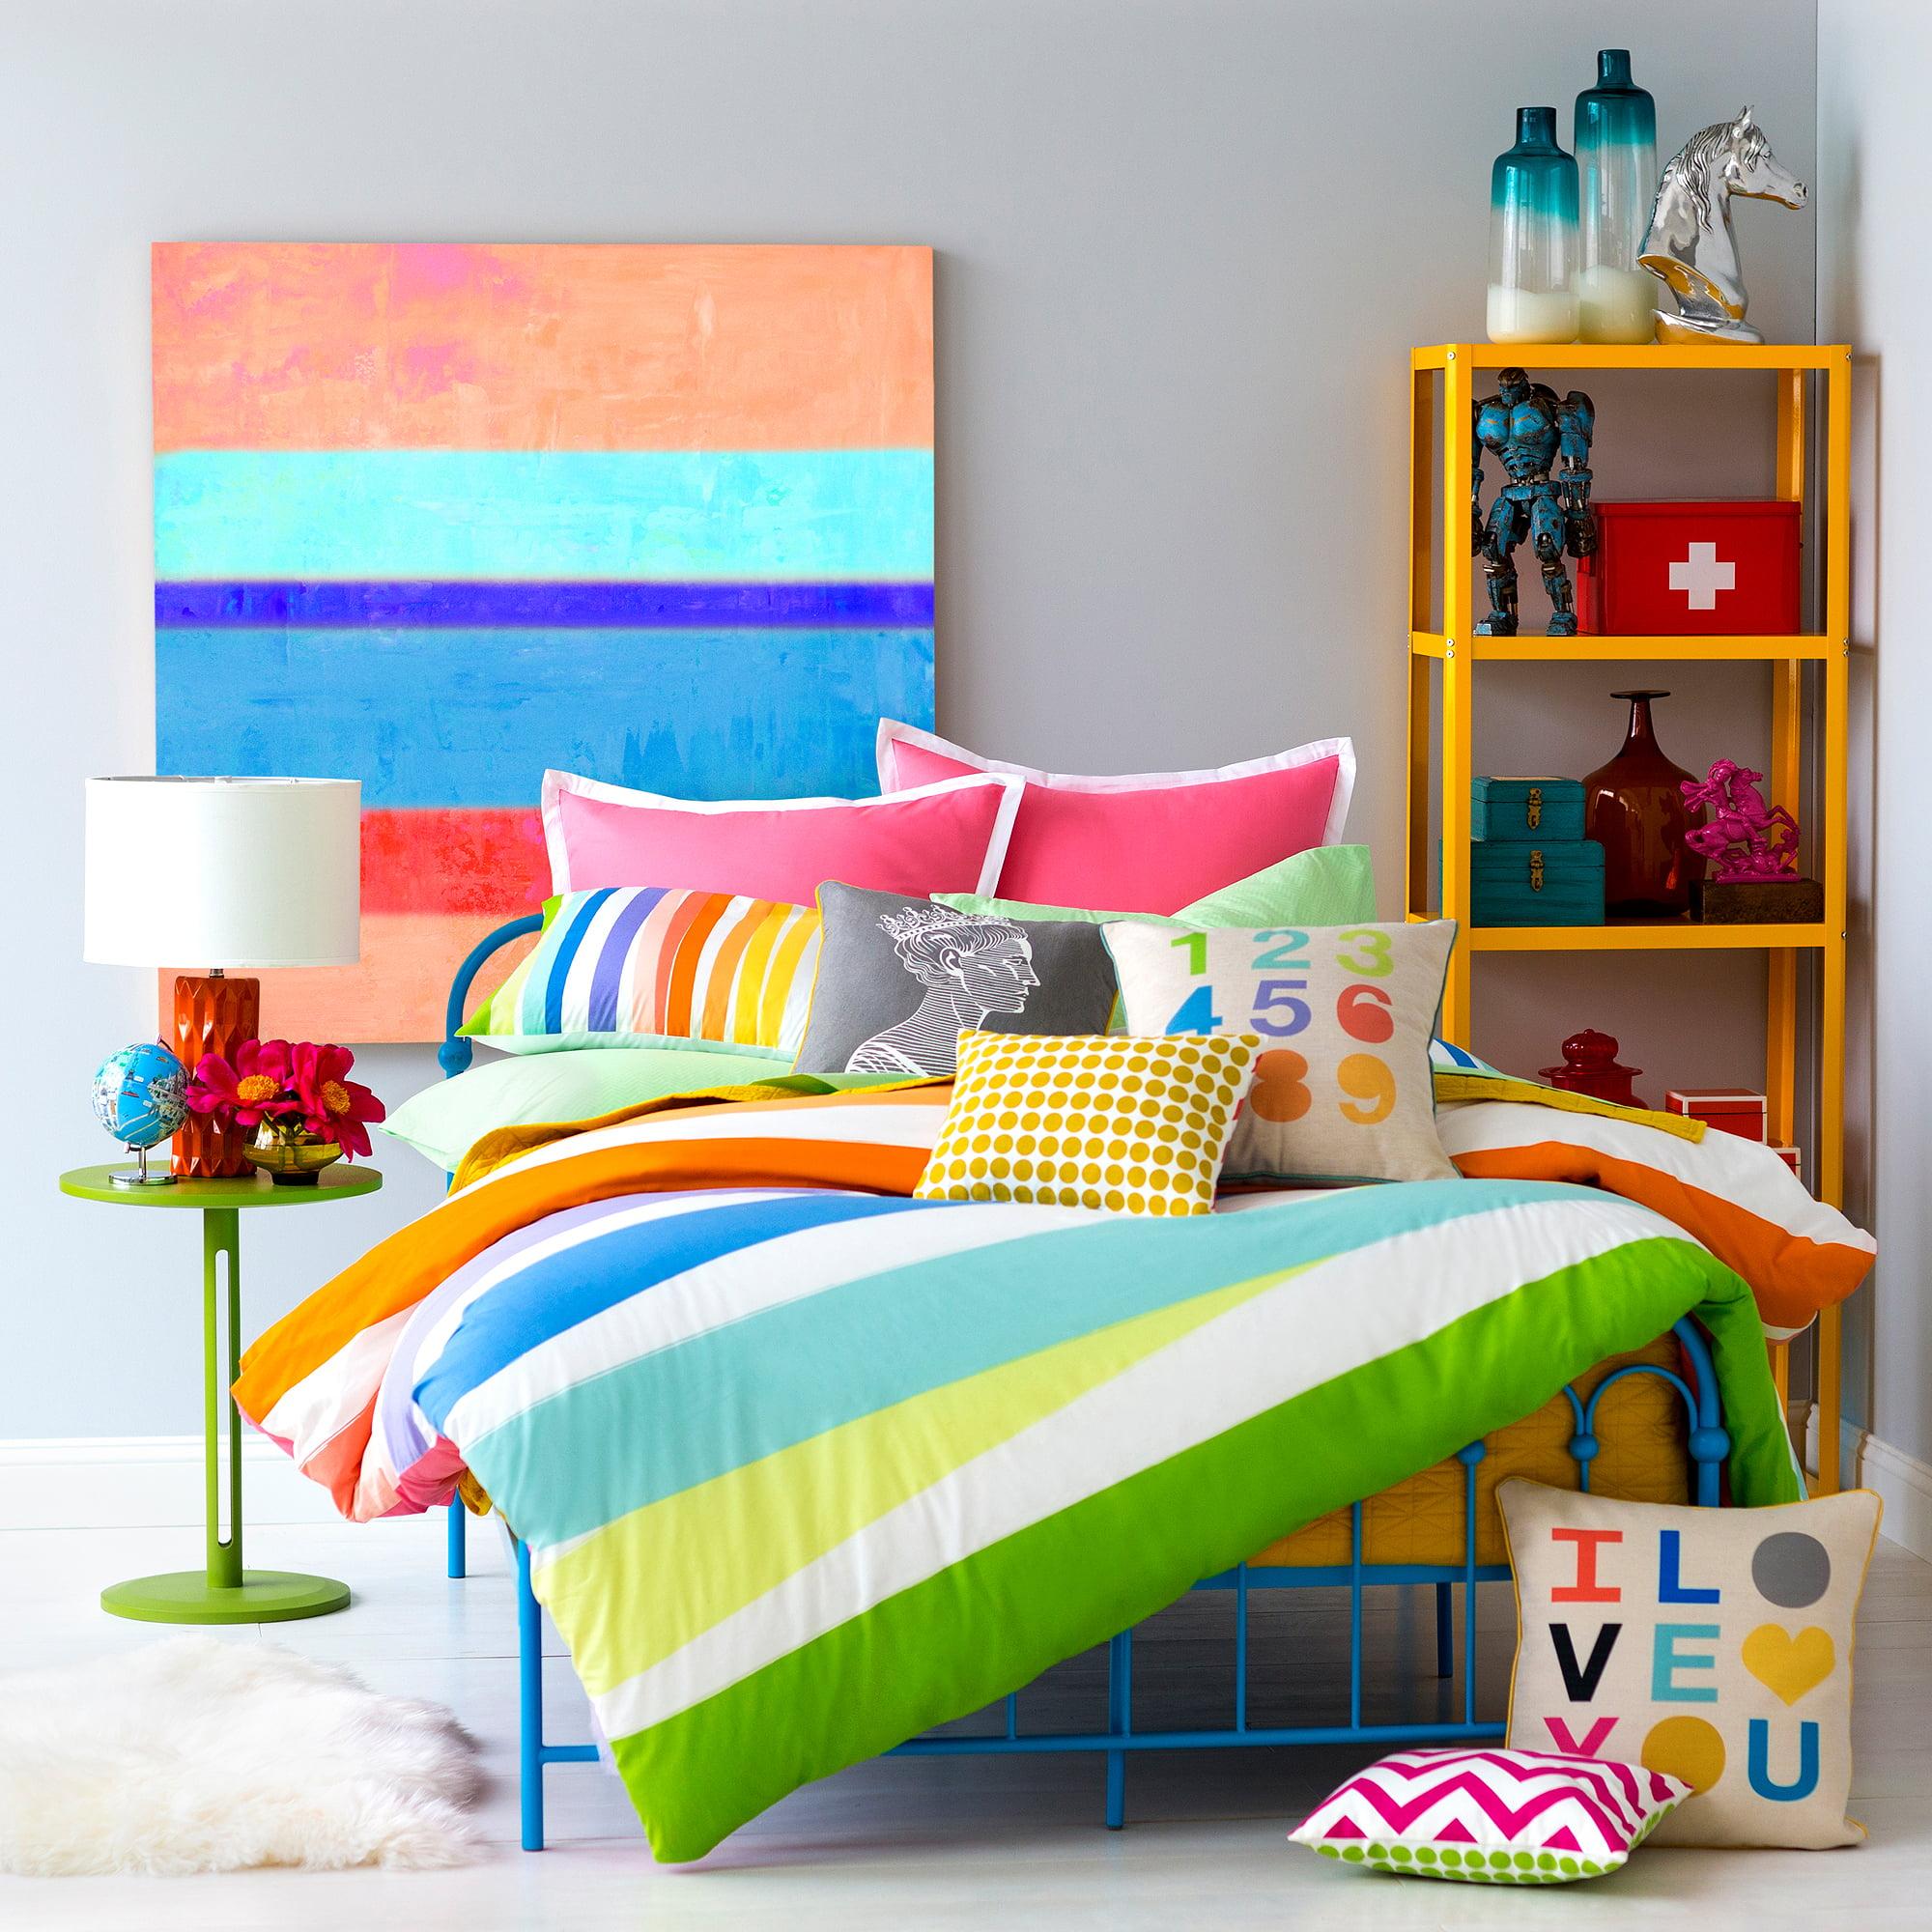 Teensu0027 Room   Every Day Low Prices | Walmart.com